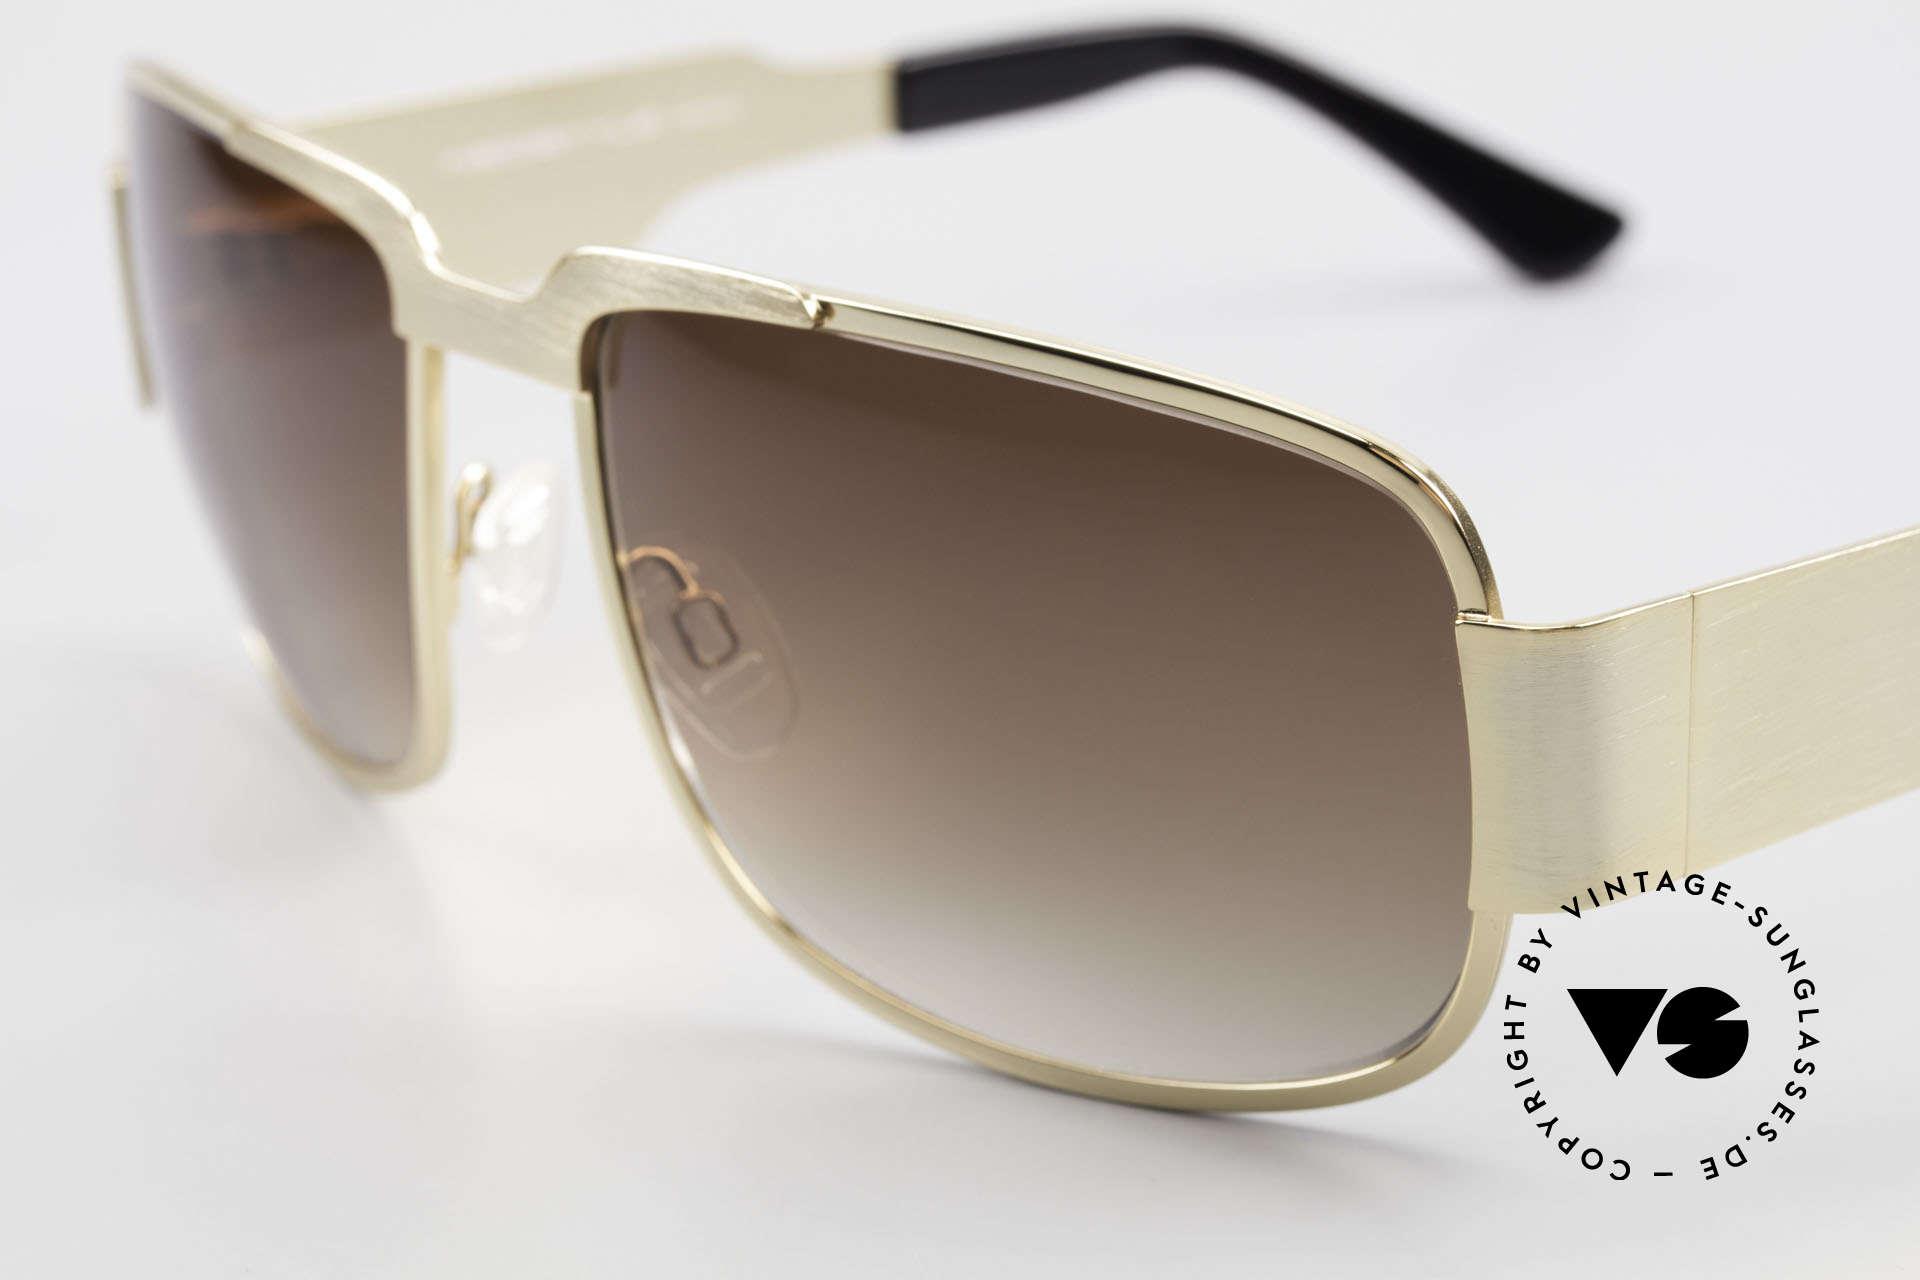 Neostyle Nautic 2 Brad Pitt Tarantino Sunglasses, Nautic 2: the re-issue of the legendary 70's Elvis glasses, Made for Men